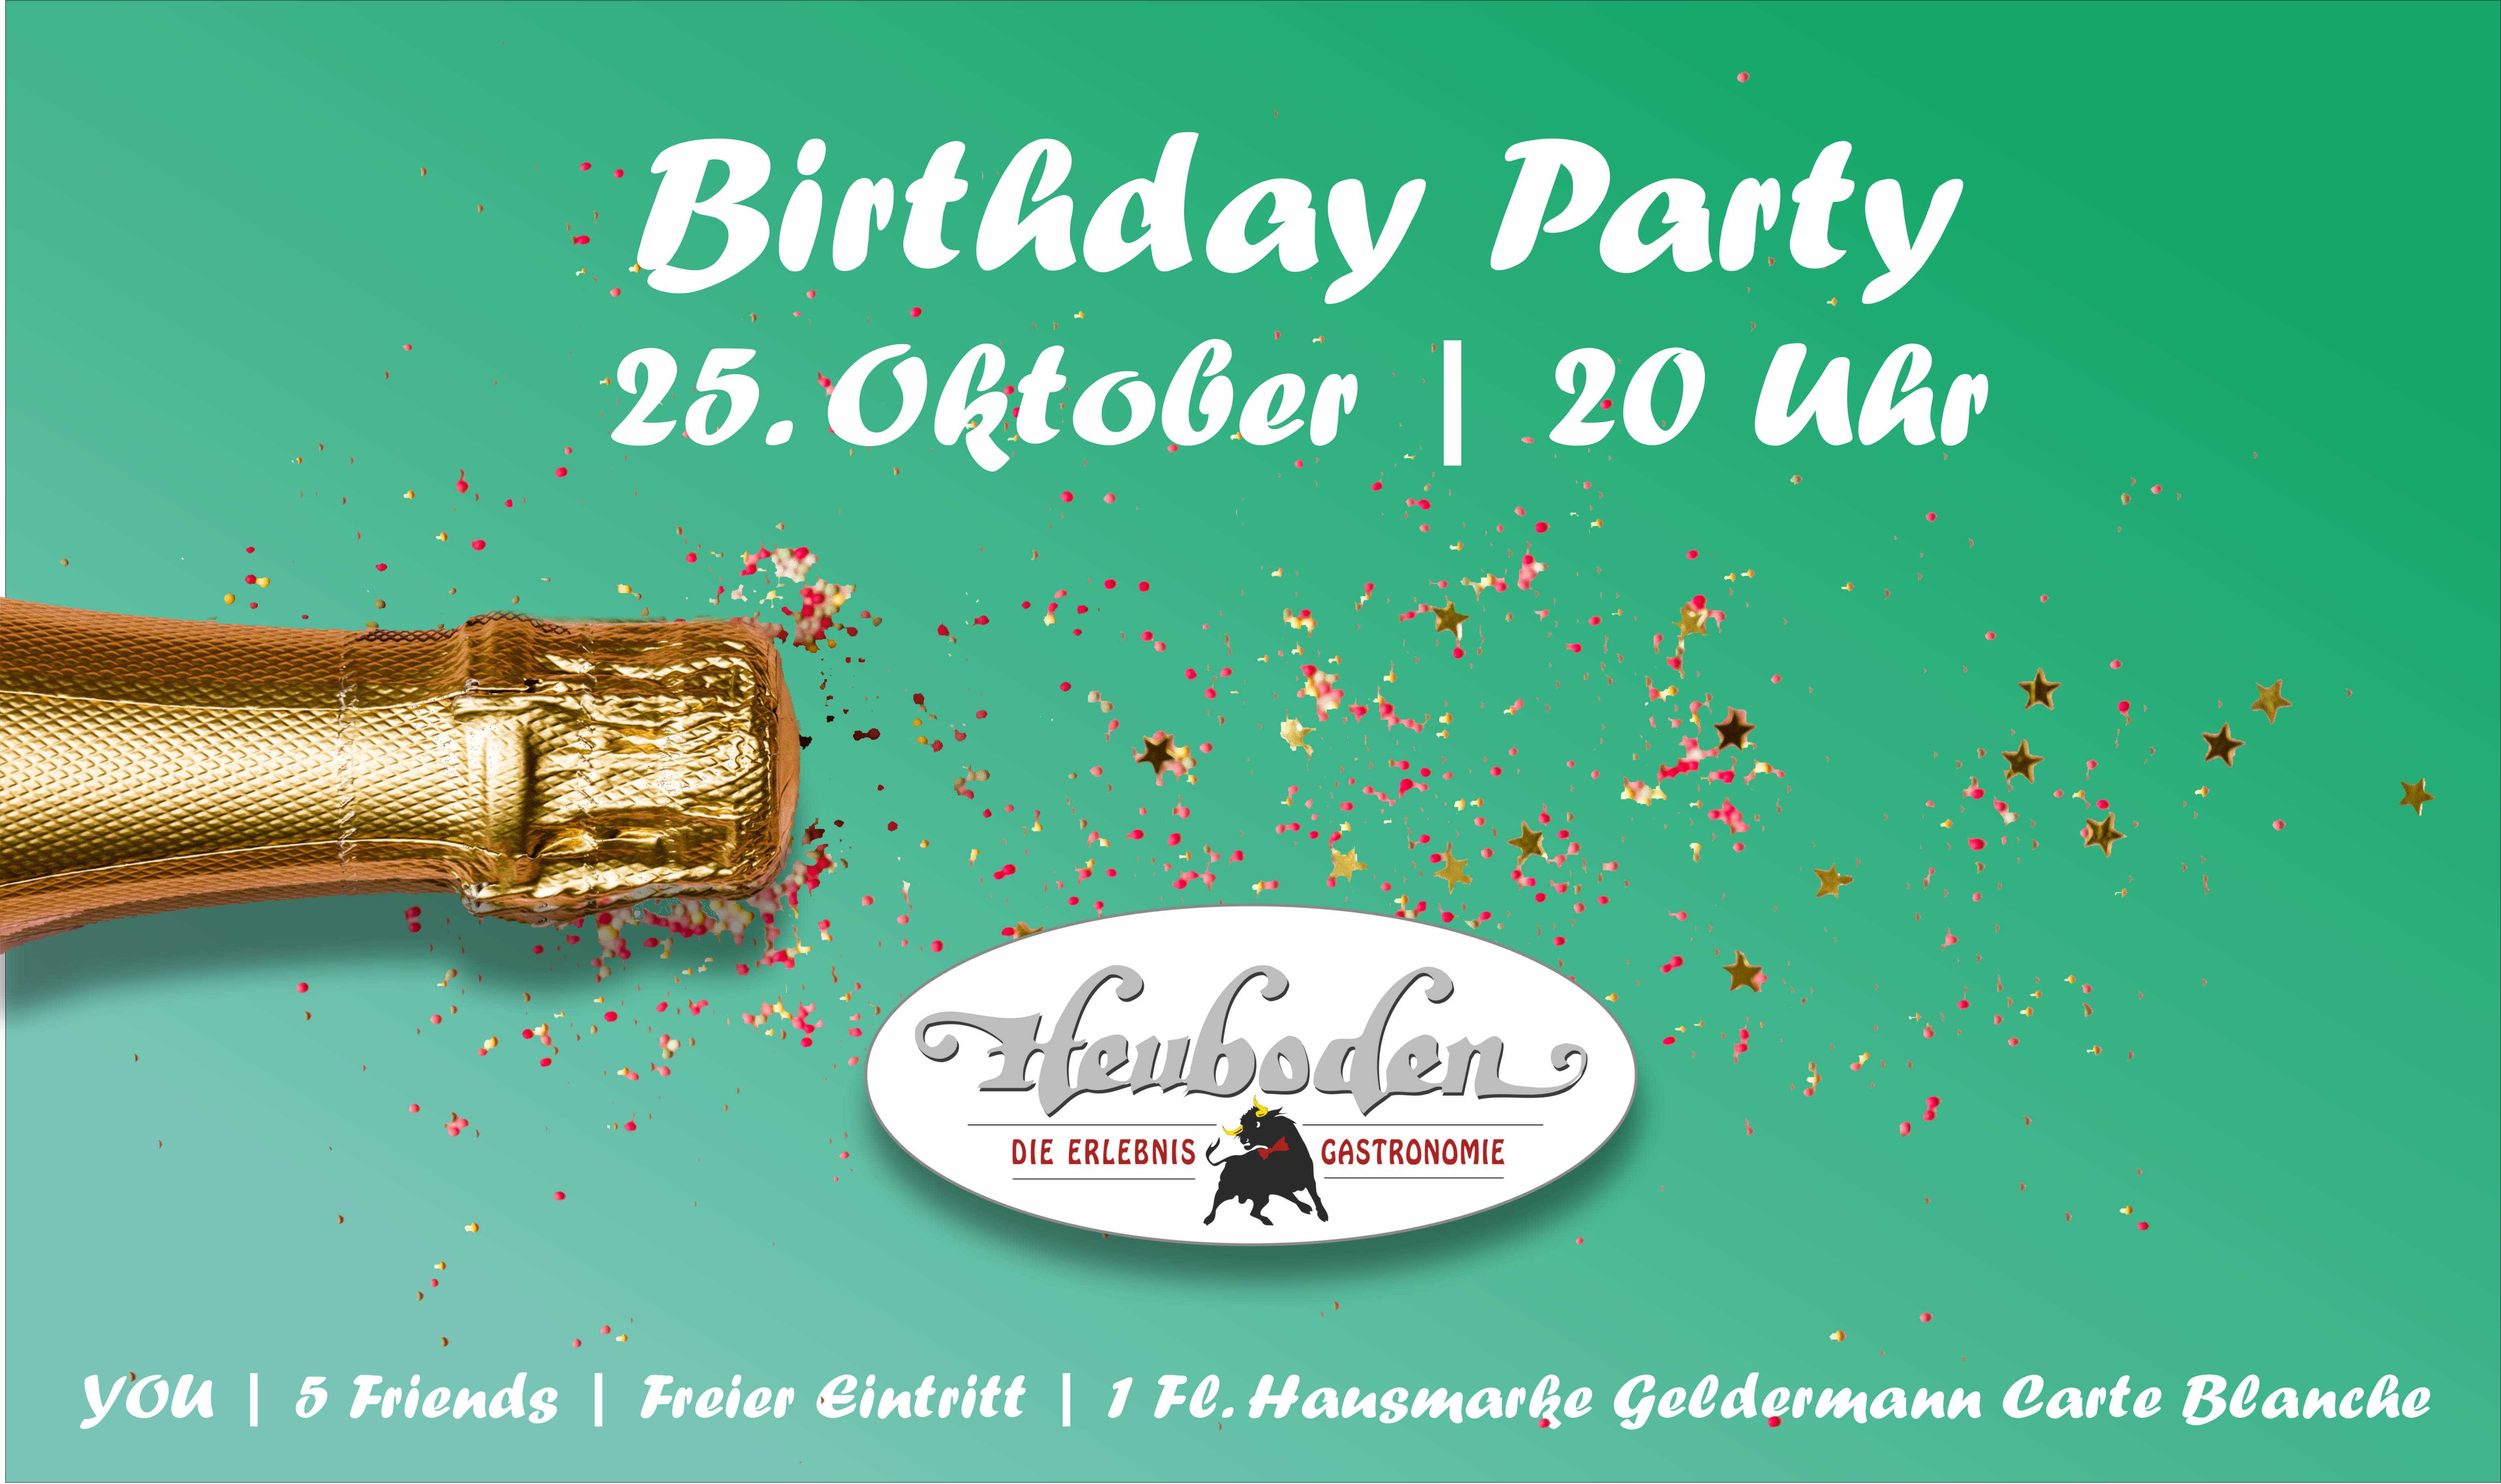 Facebook Banner Birthday Party Oktober 2019